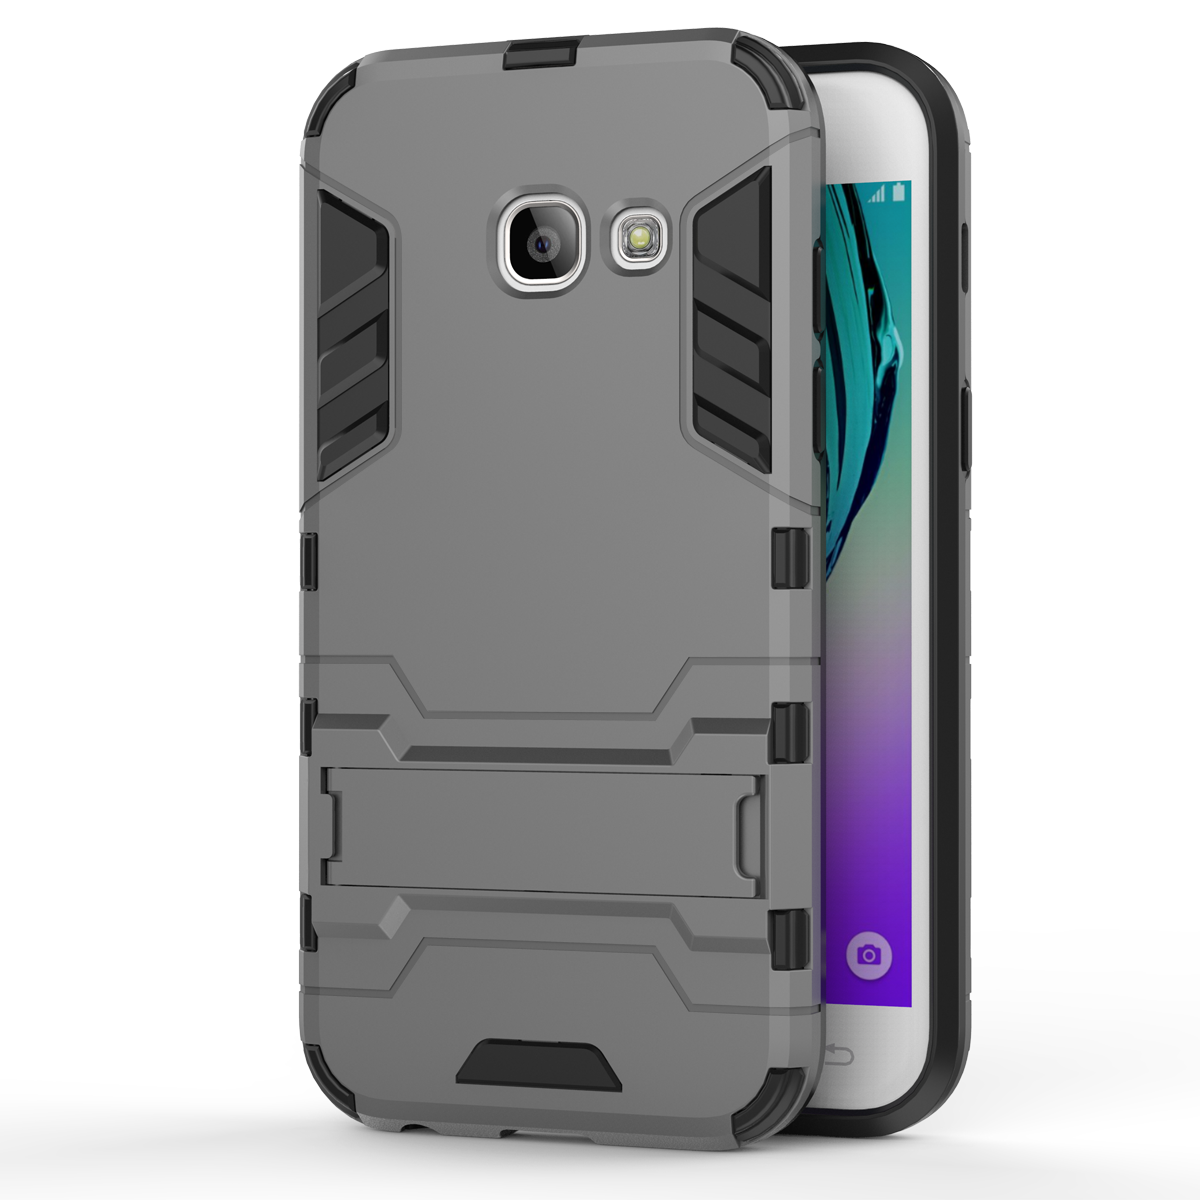 Armor Kickstand Protective Phone Cover Case for Samsung Galaxy A3 (2017) - Gray